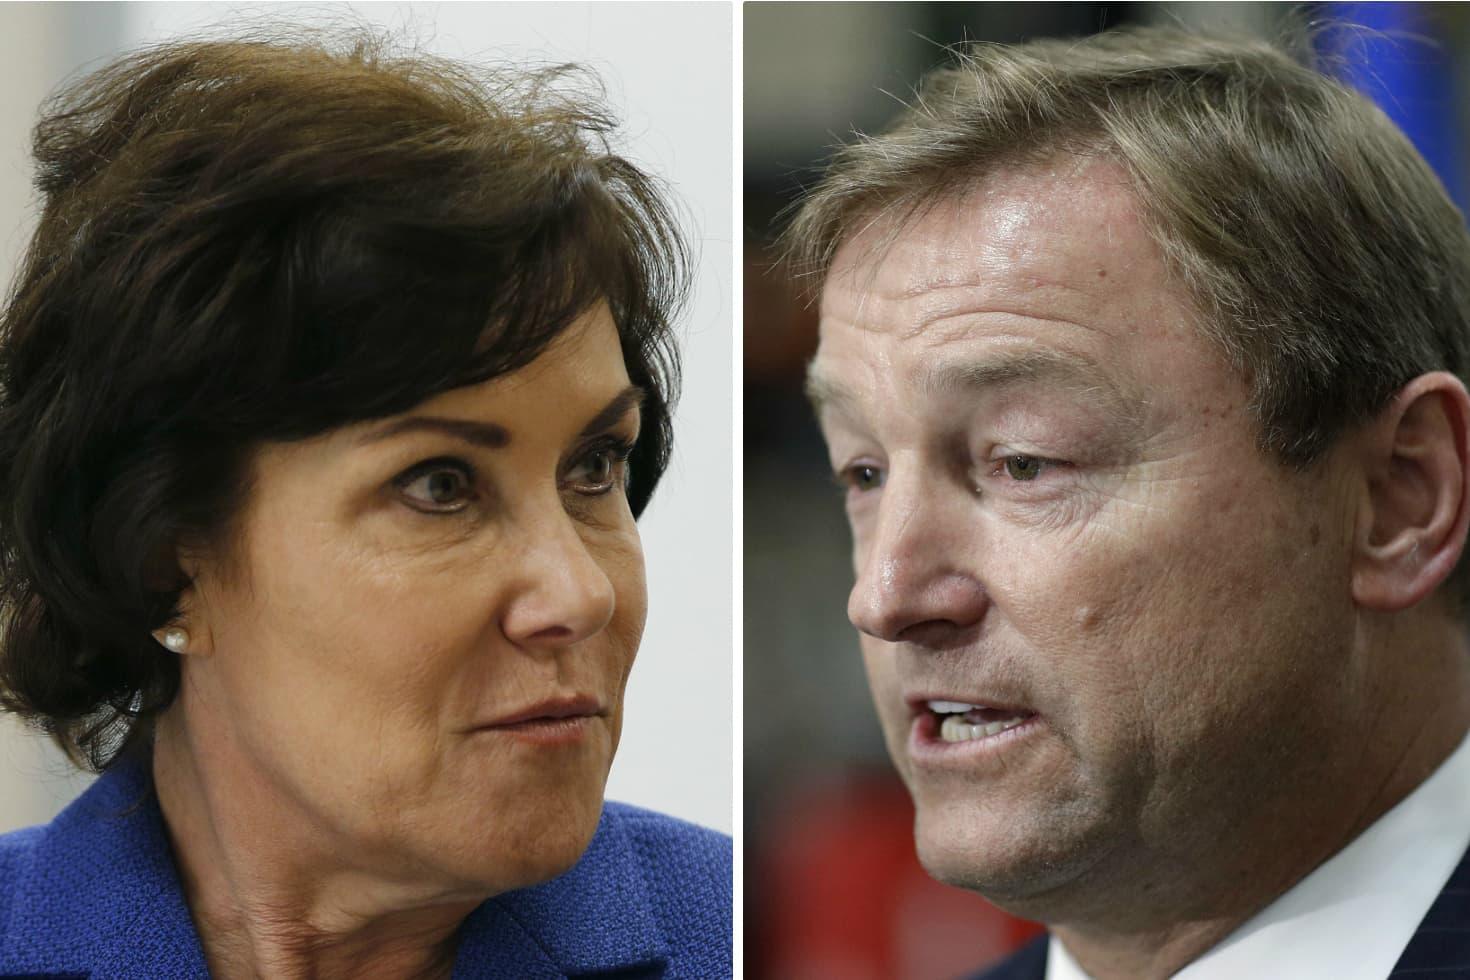 Nevada Democratic U.S. Rep. Jacky Rosen (left) and GOP Sen. Dean Heller. (AP Photos)